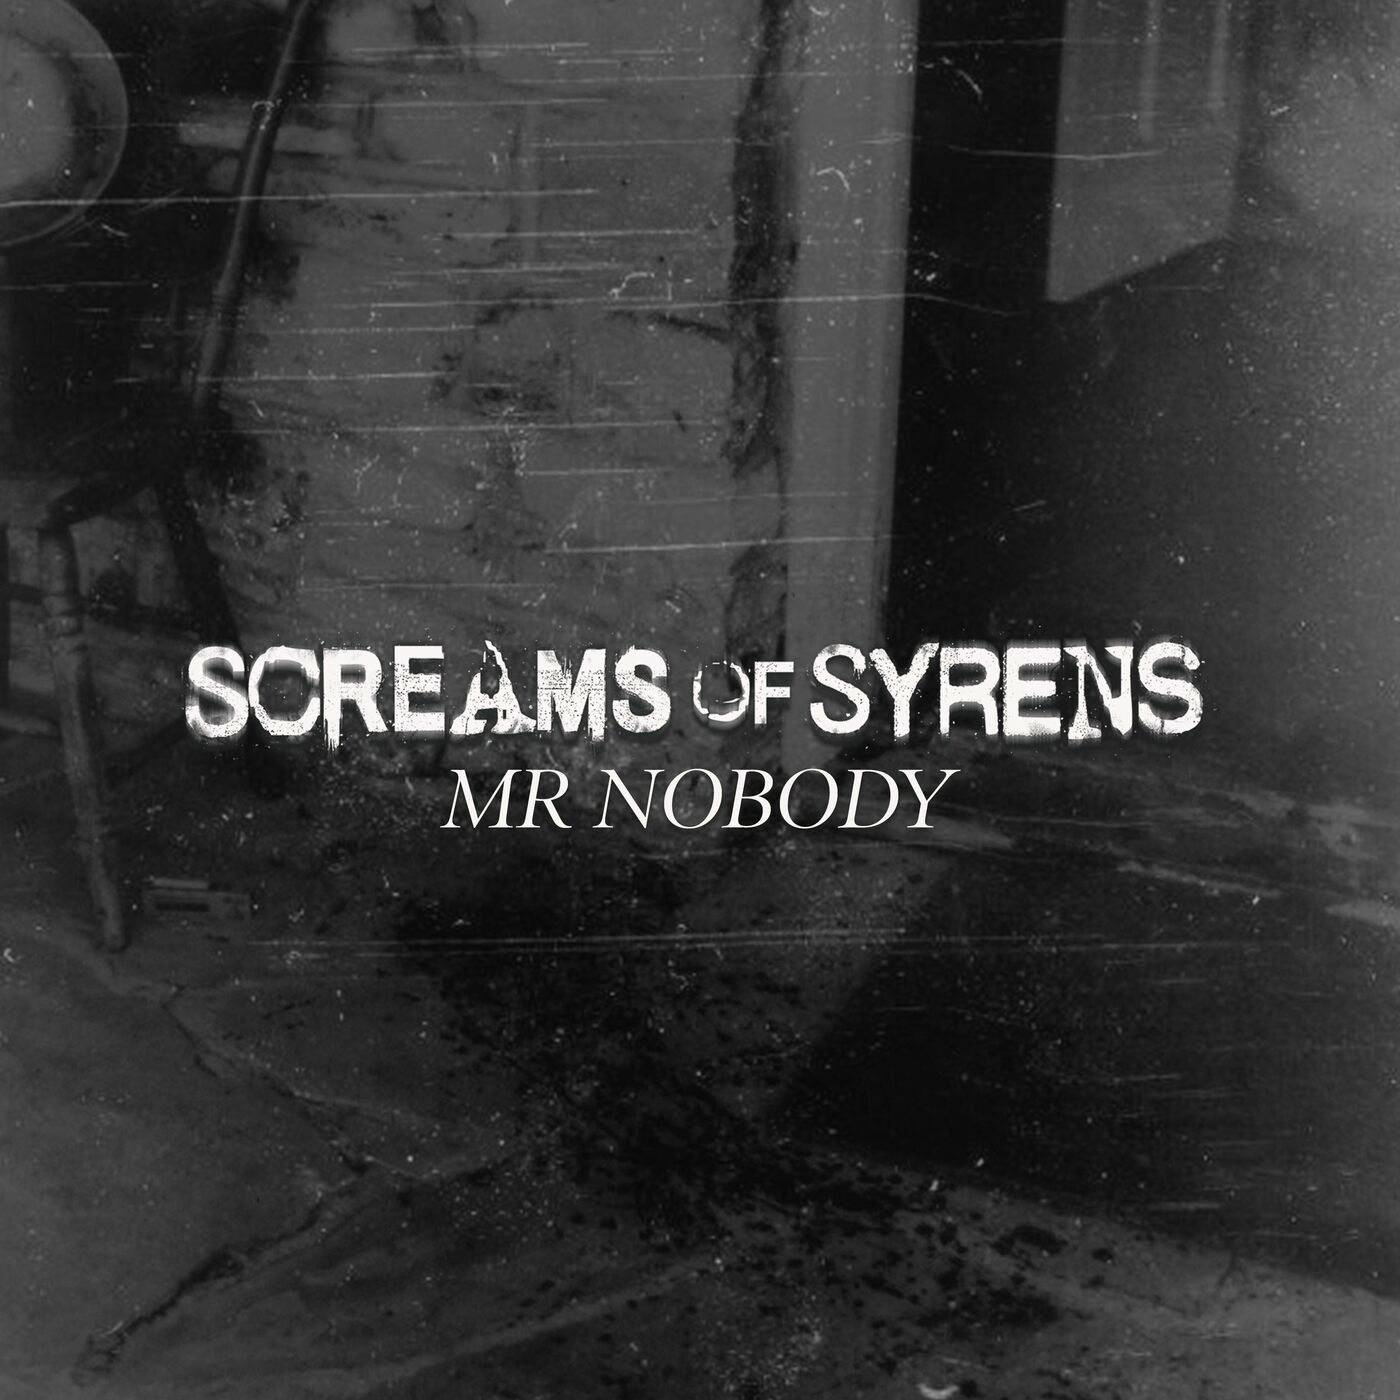 Screams of Syrens - Mr Nobody [single] (2020)